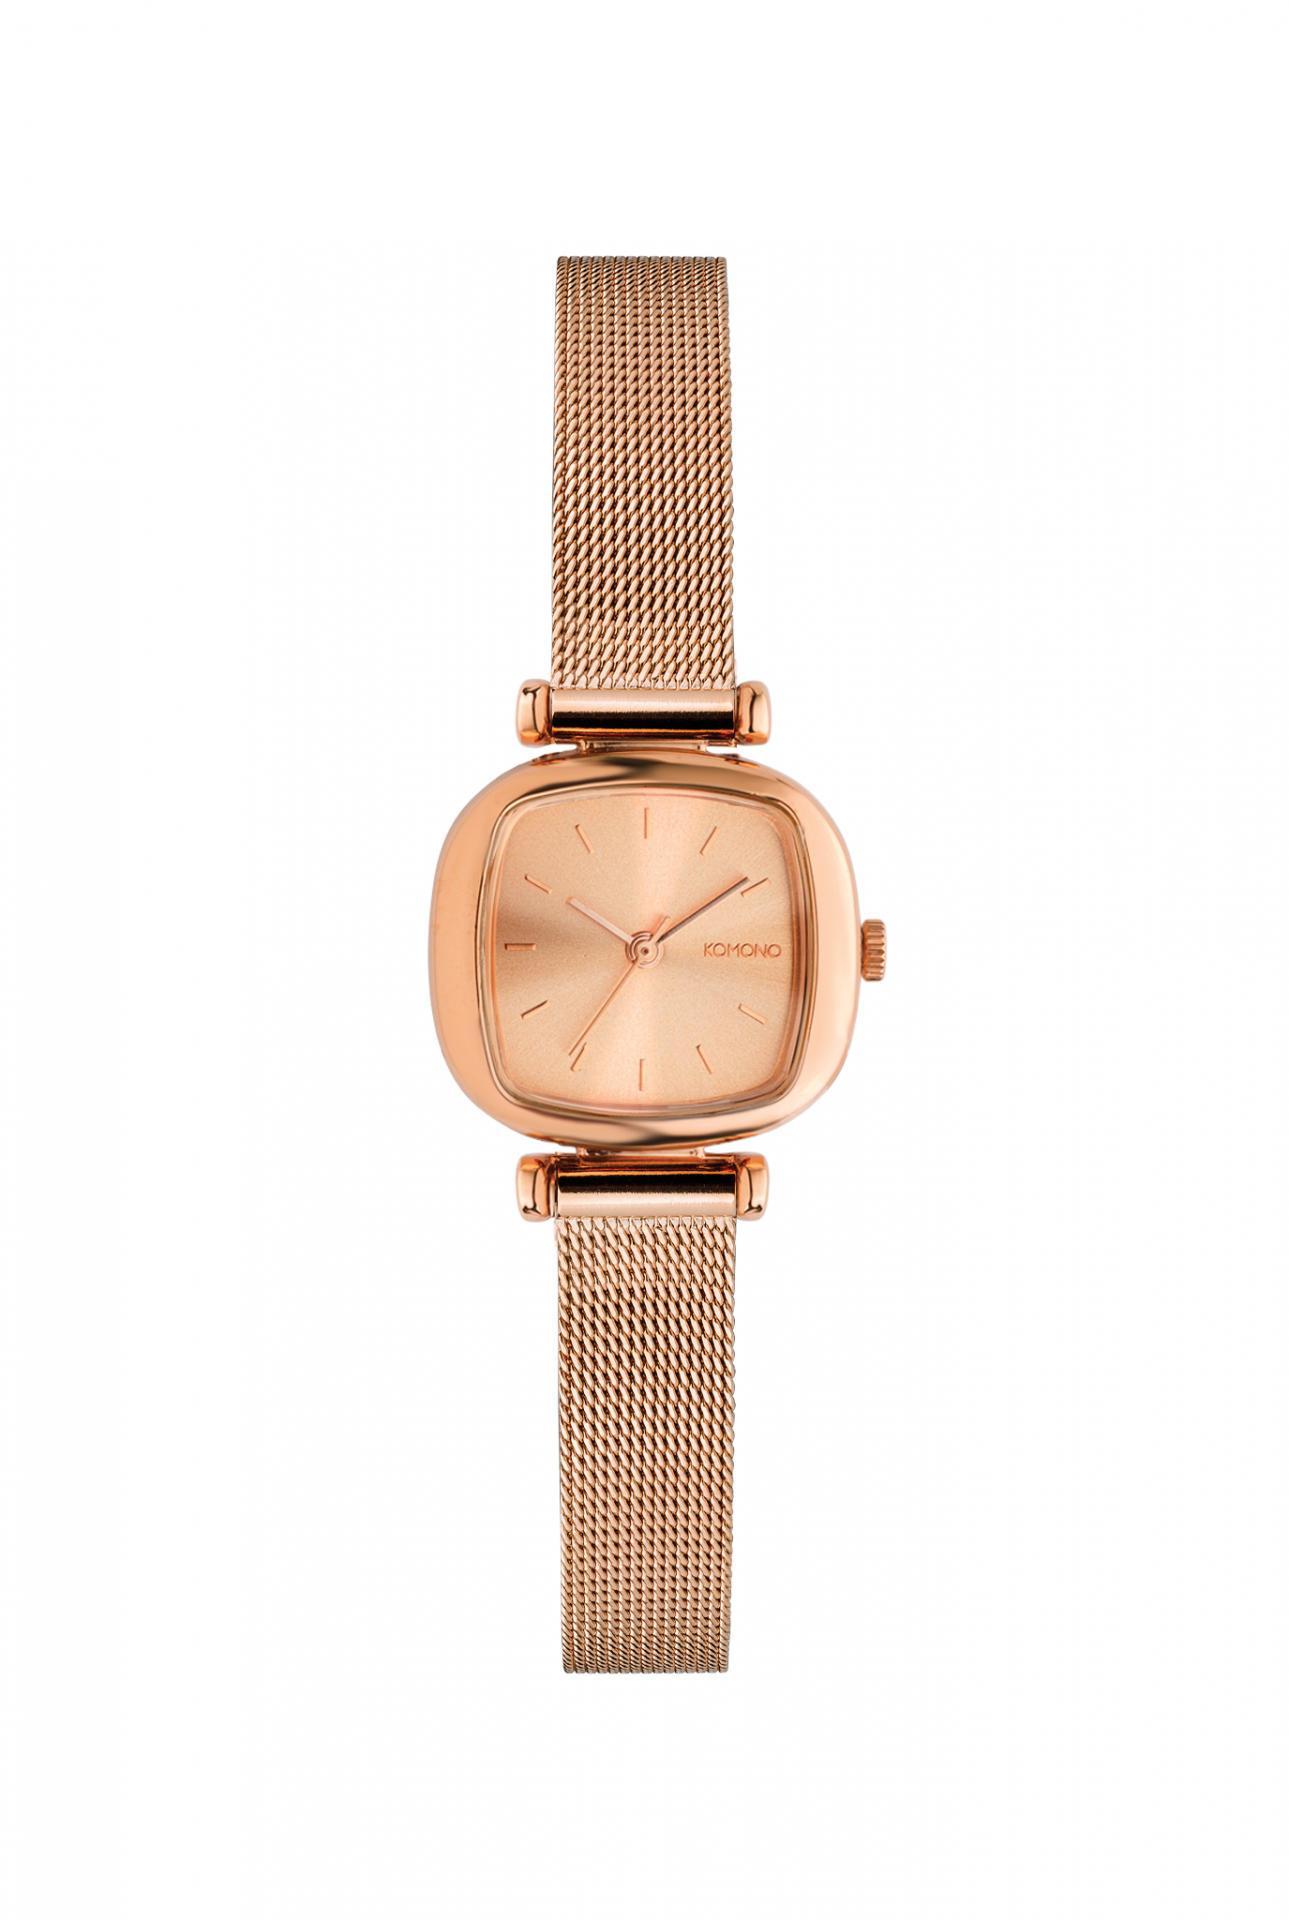 Komono Dámské hodinky Komono Moneypenny Royale Rose Gold, zlatá barva, kov